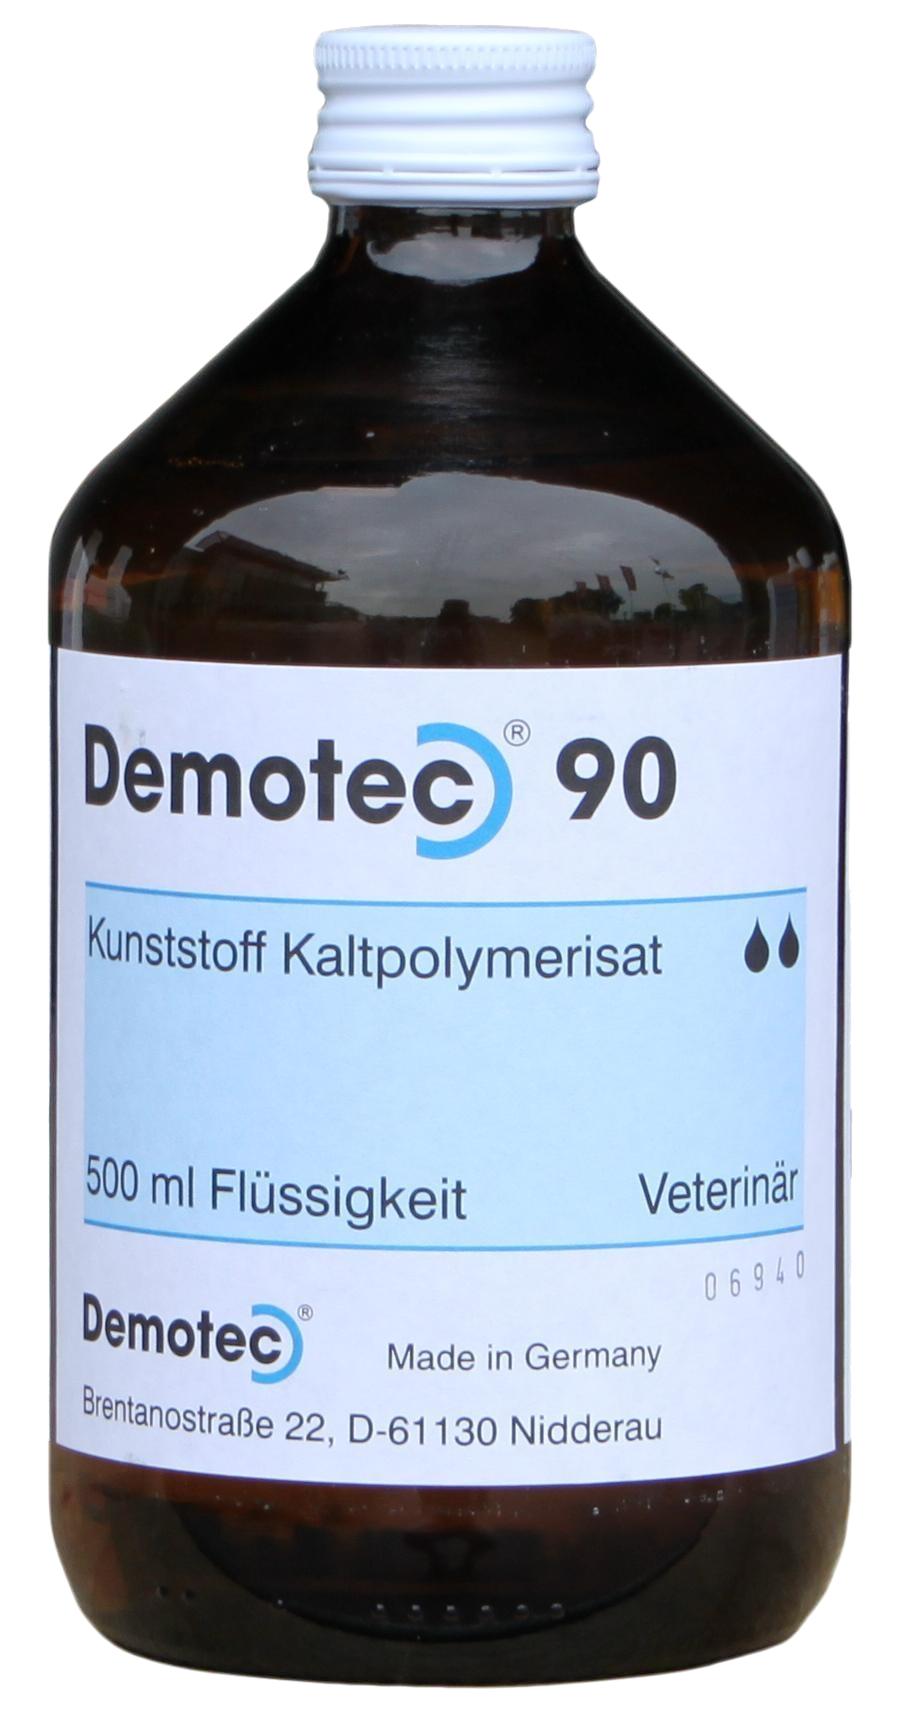 Demotec 90 vloeistof